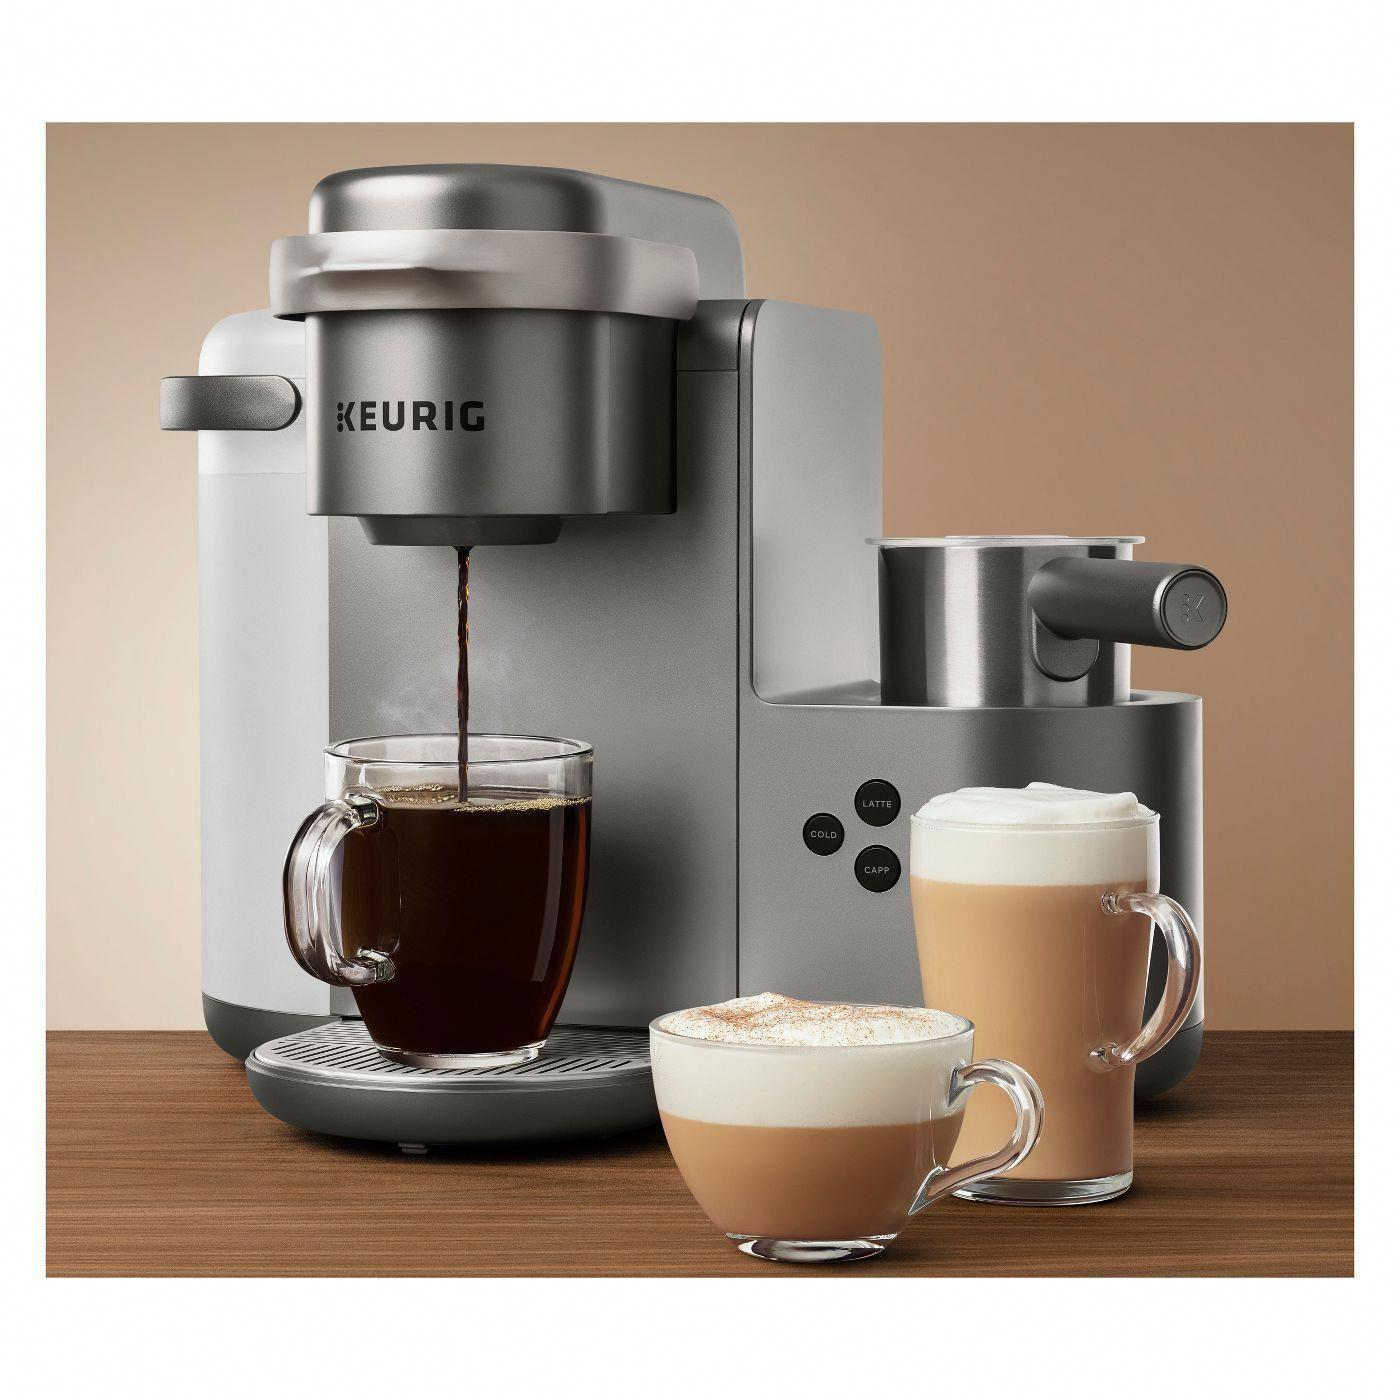 Buy coffee machine mielecoffeemachine latte maker